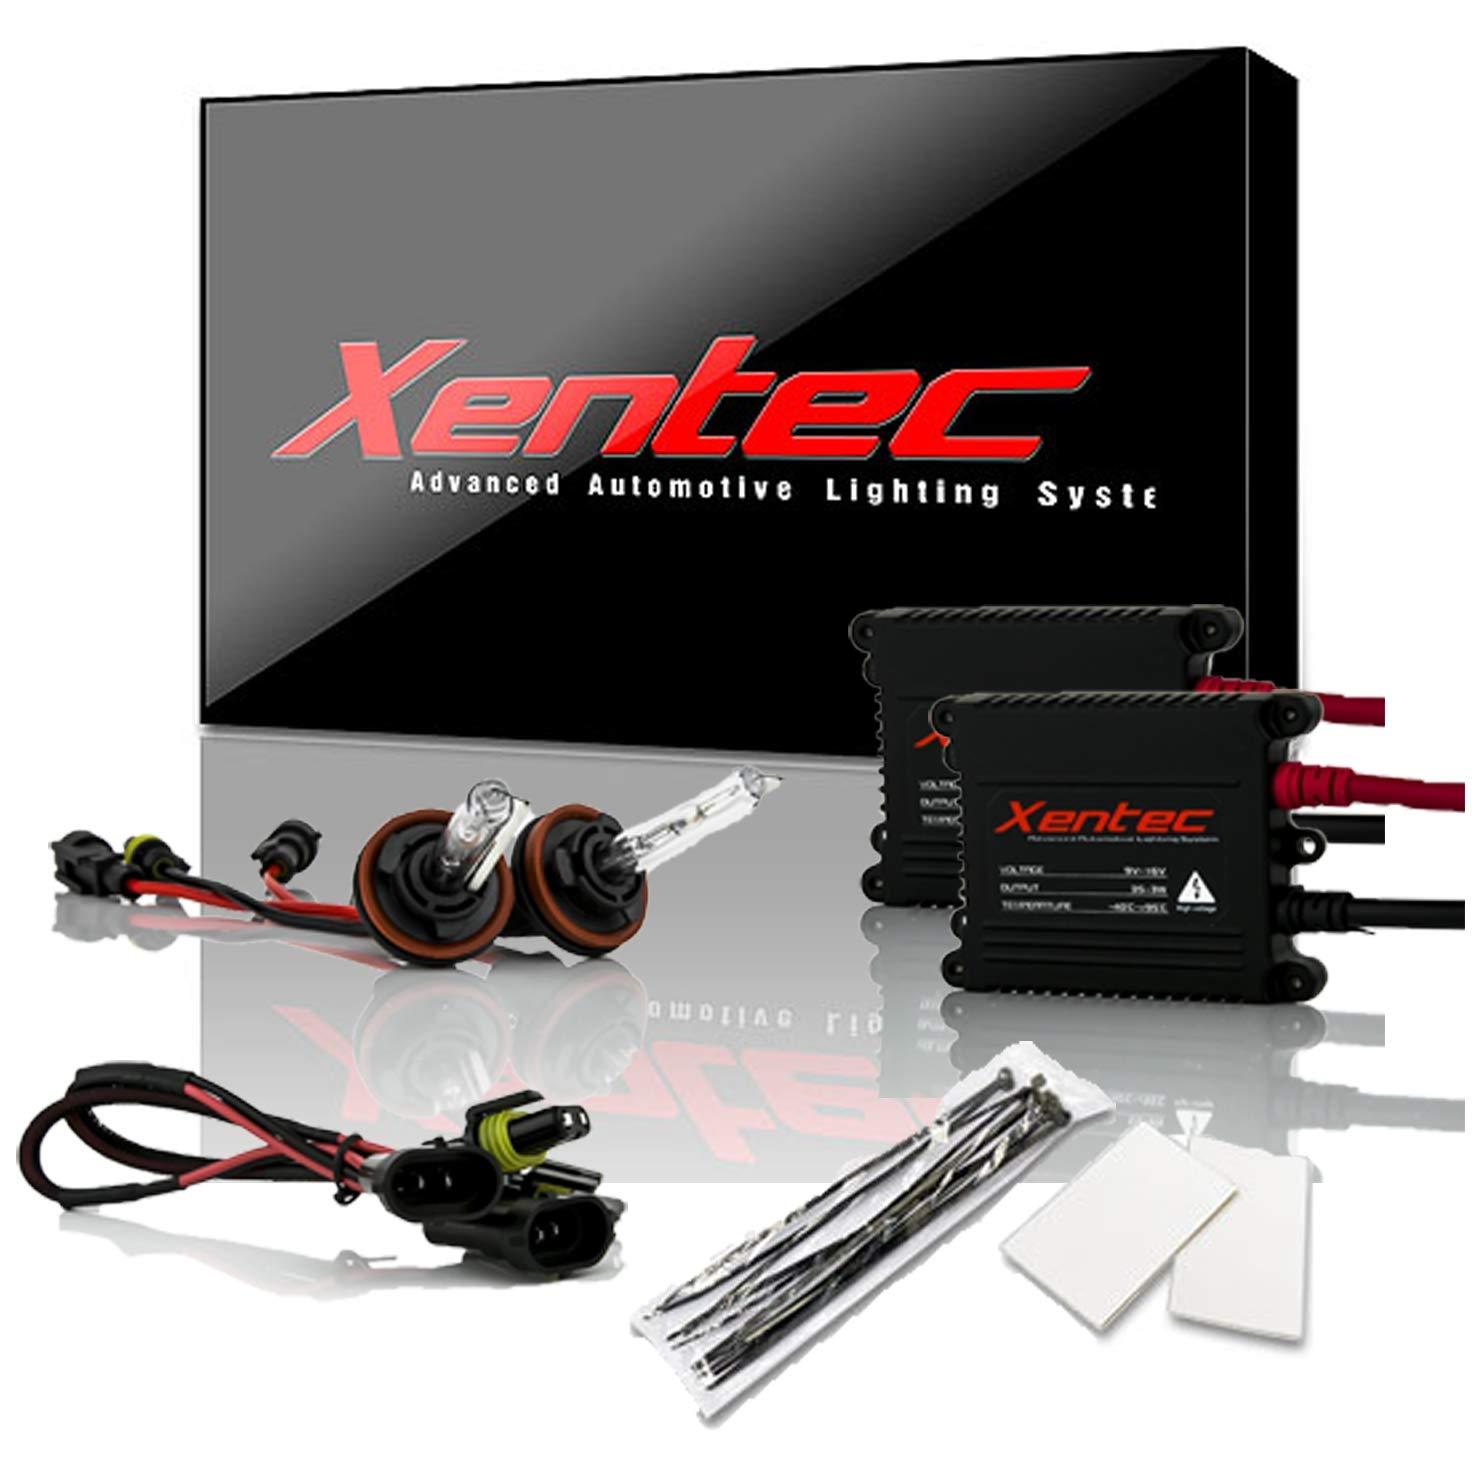 Lightning Blue H8//H9 Xentec Xenon bulb H11 8000K x 1 pair bundle with 2 x 35W Digital Slim Ballast